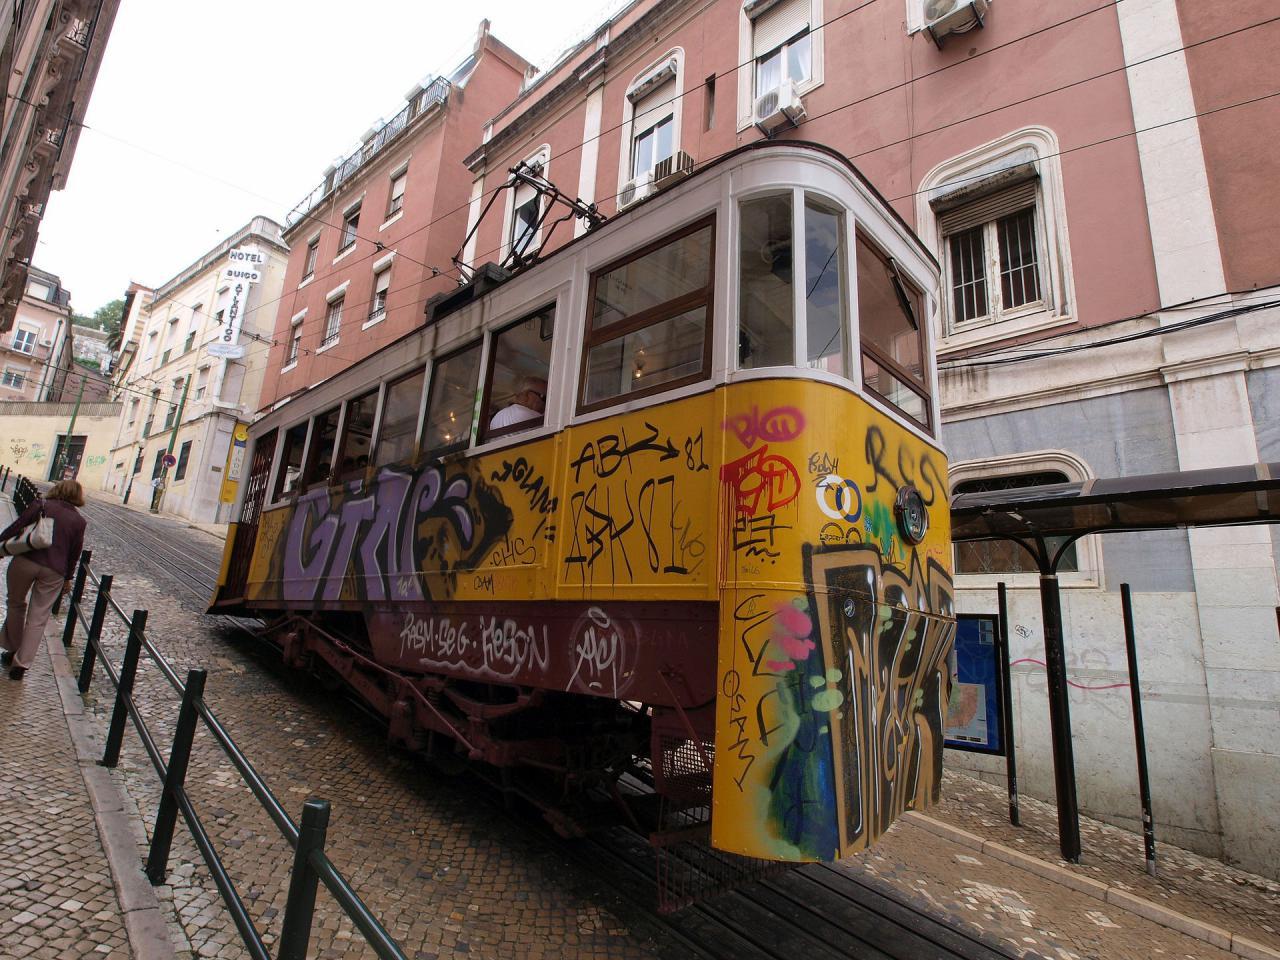 Tram in Lisboa pic-002.JPG